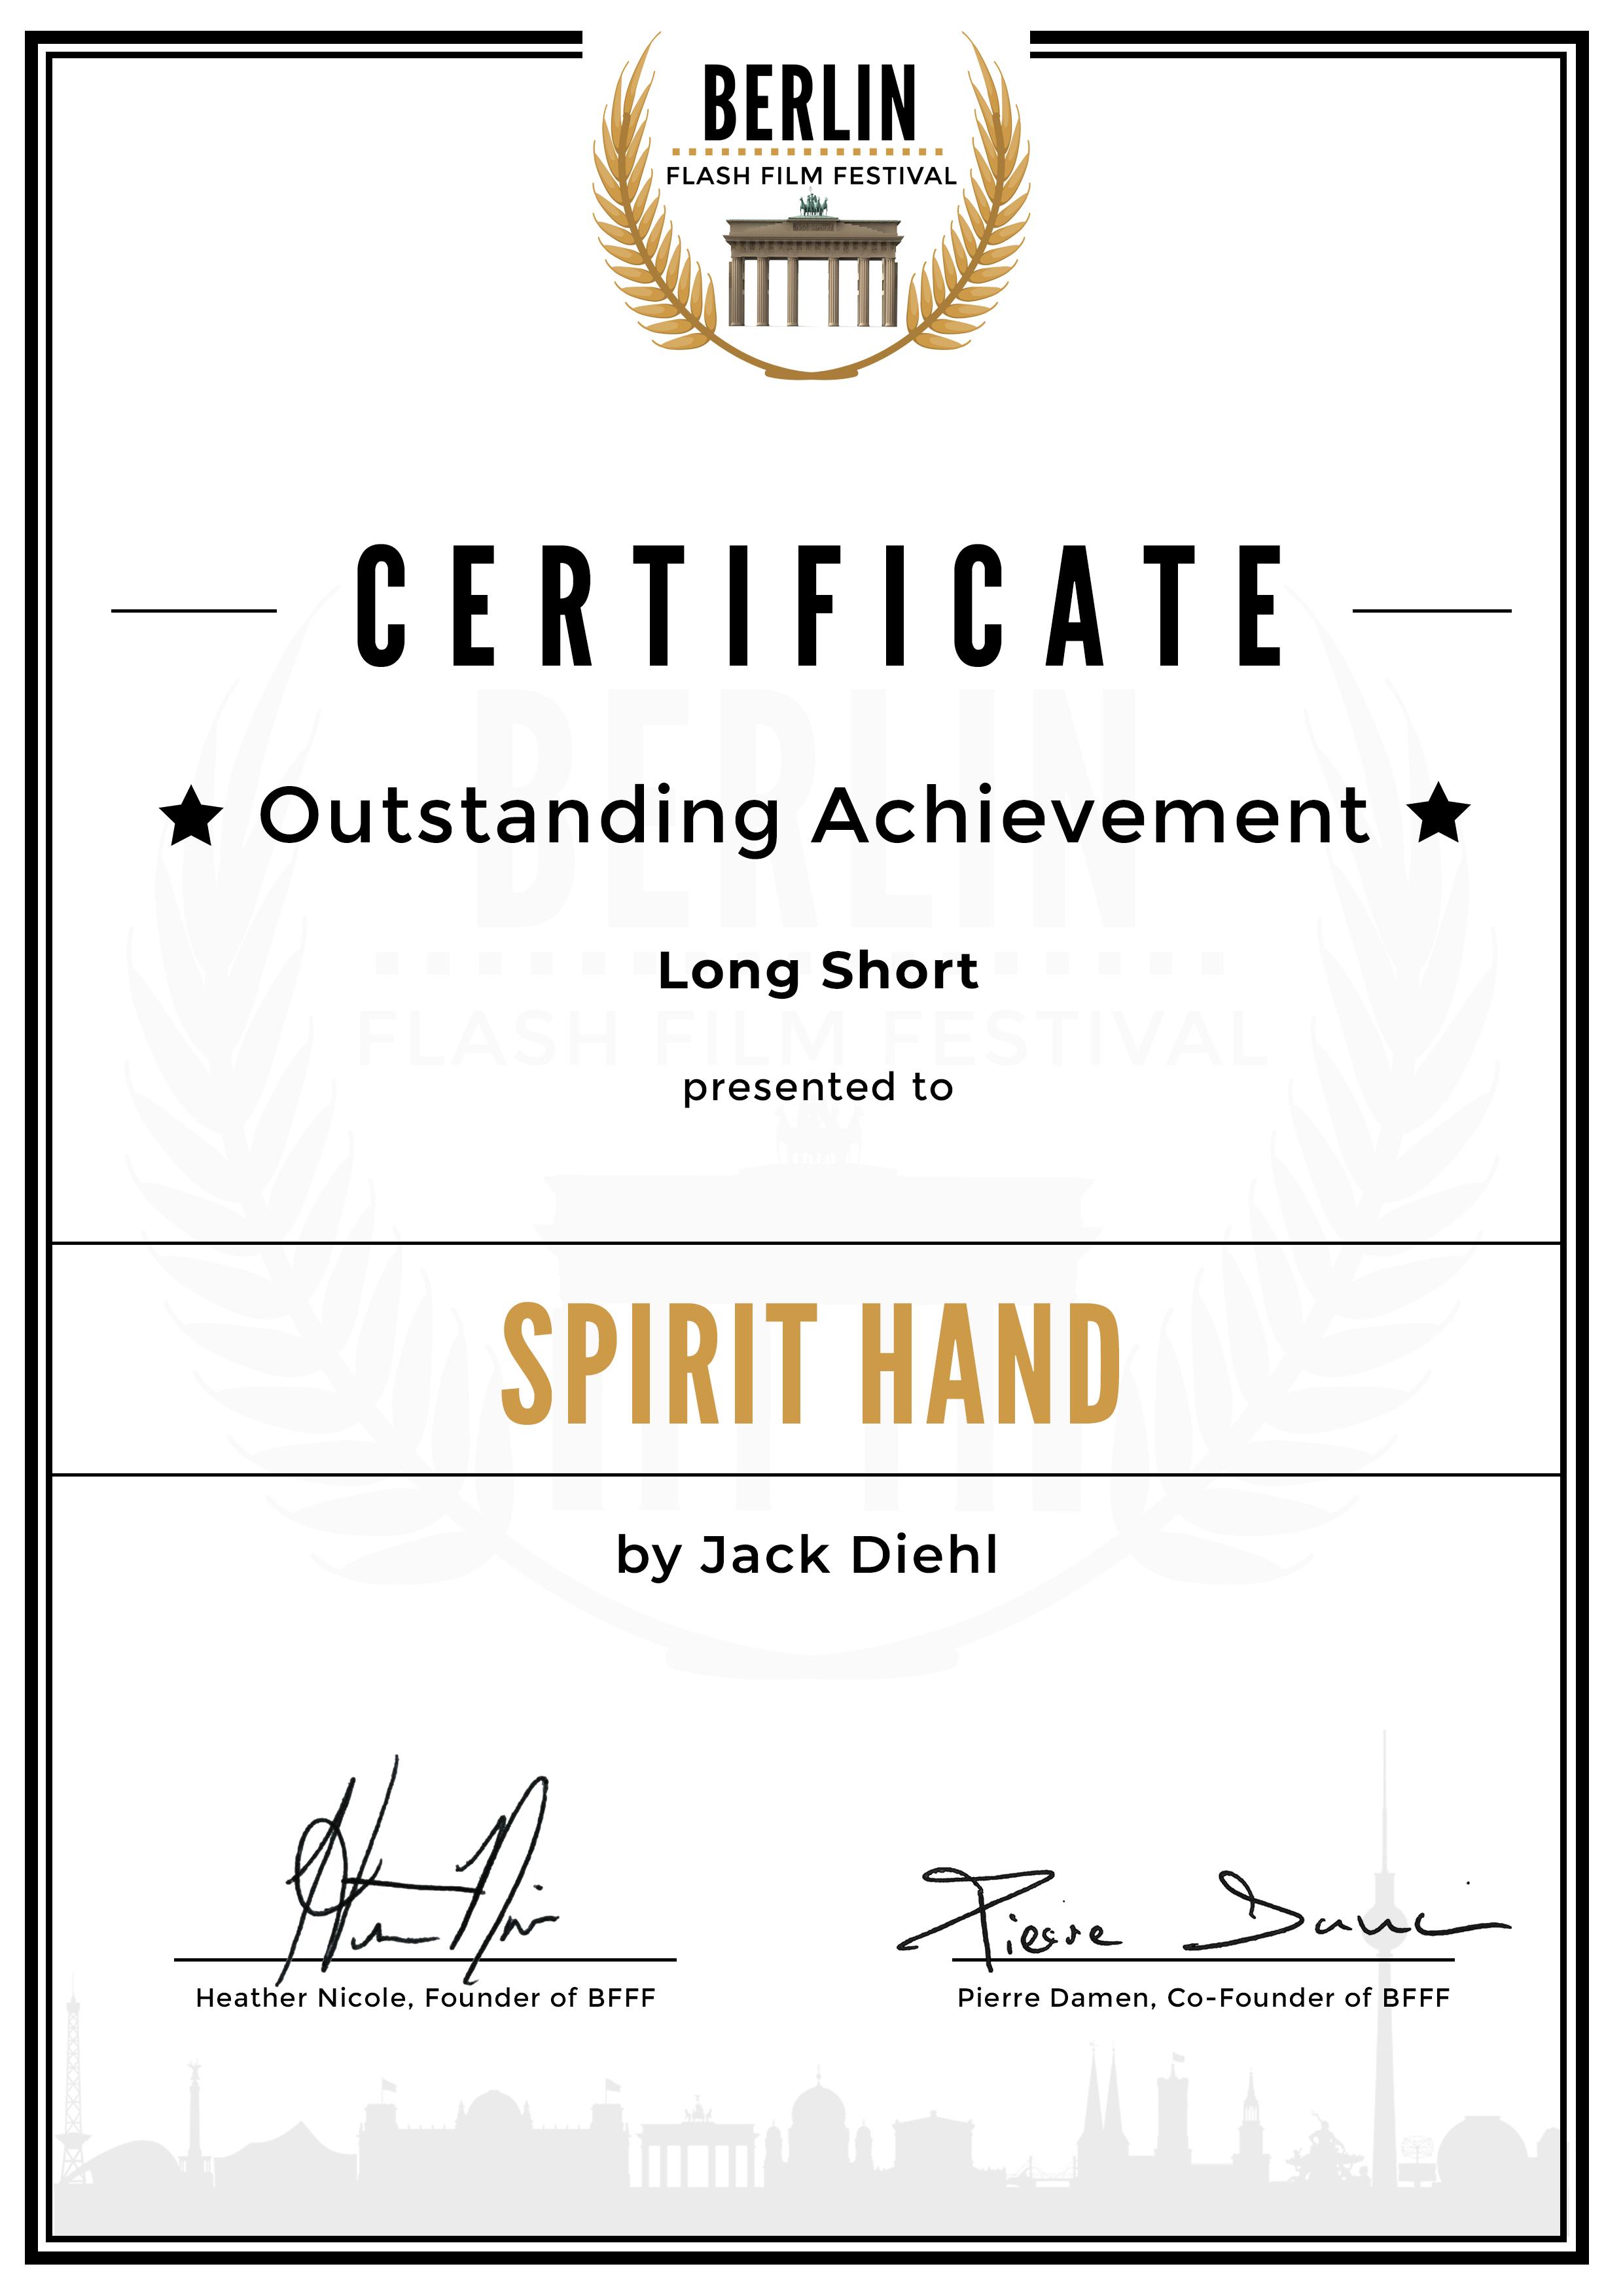 Outstanding Achievement Award - BFFF